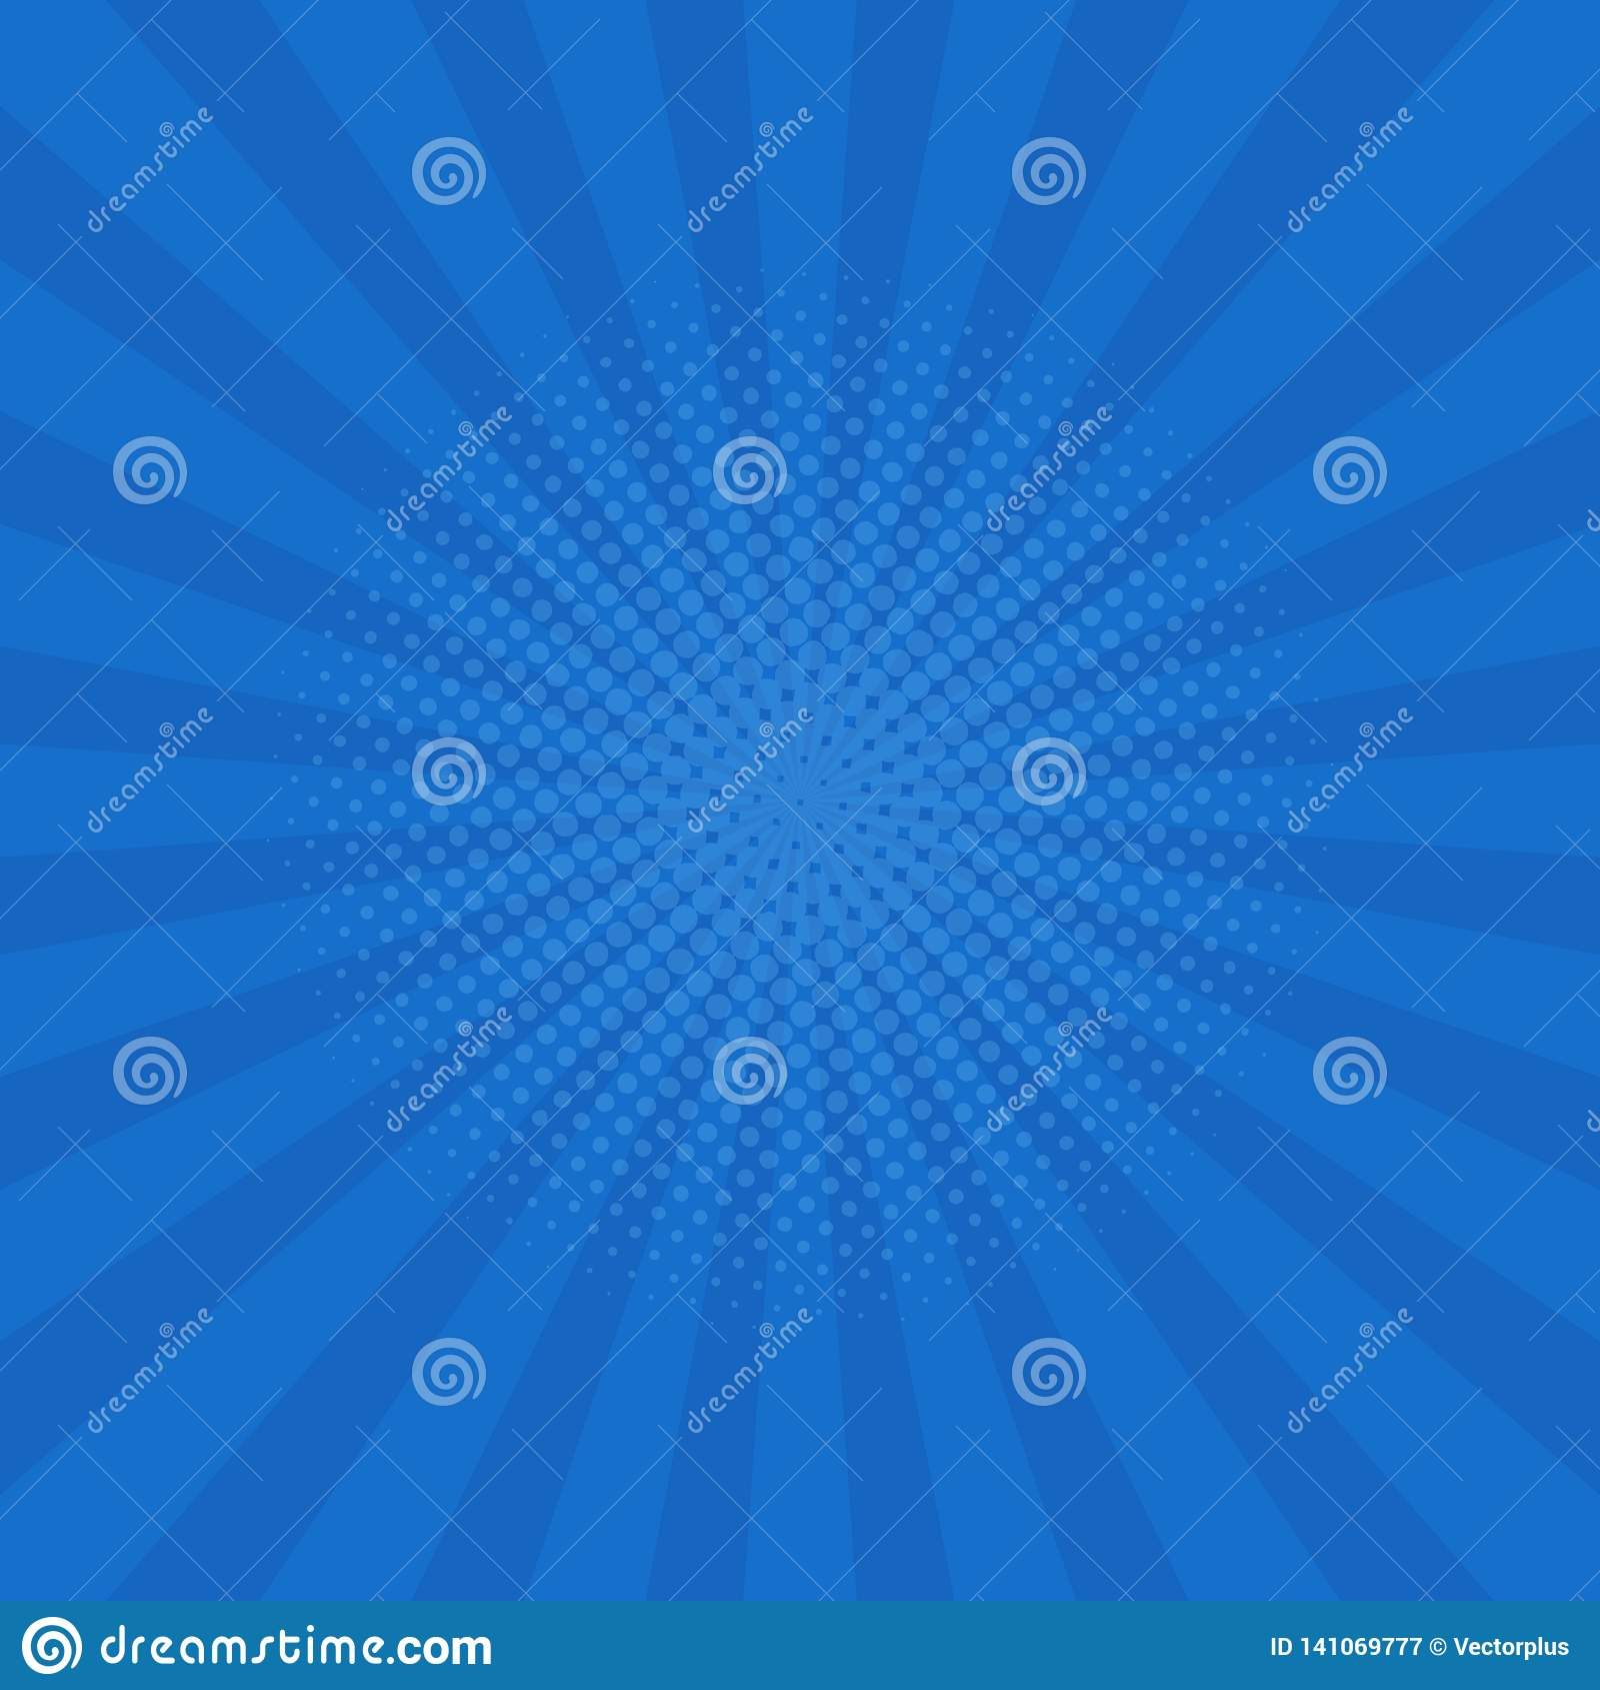 Bright blue rays background. Comics, pop art style. Vector